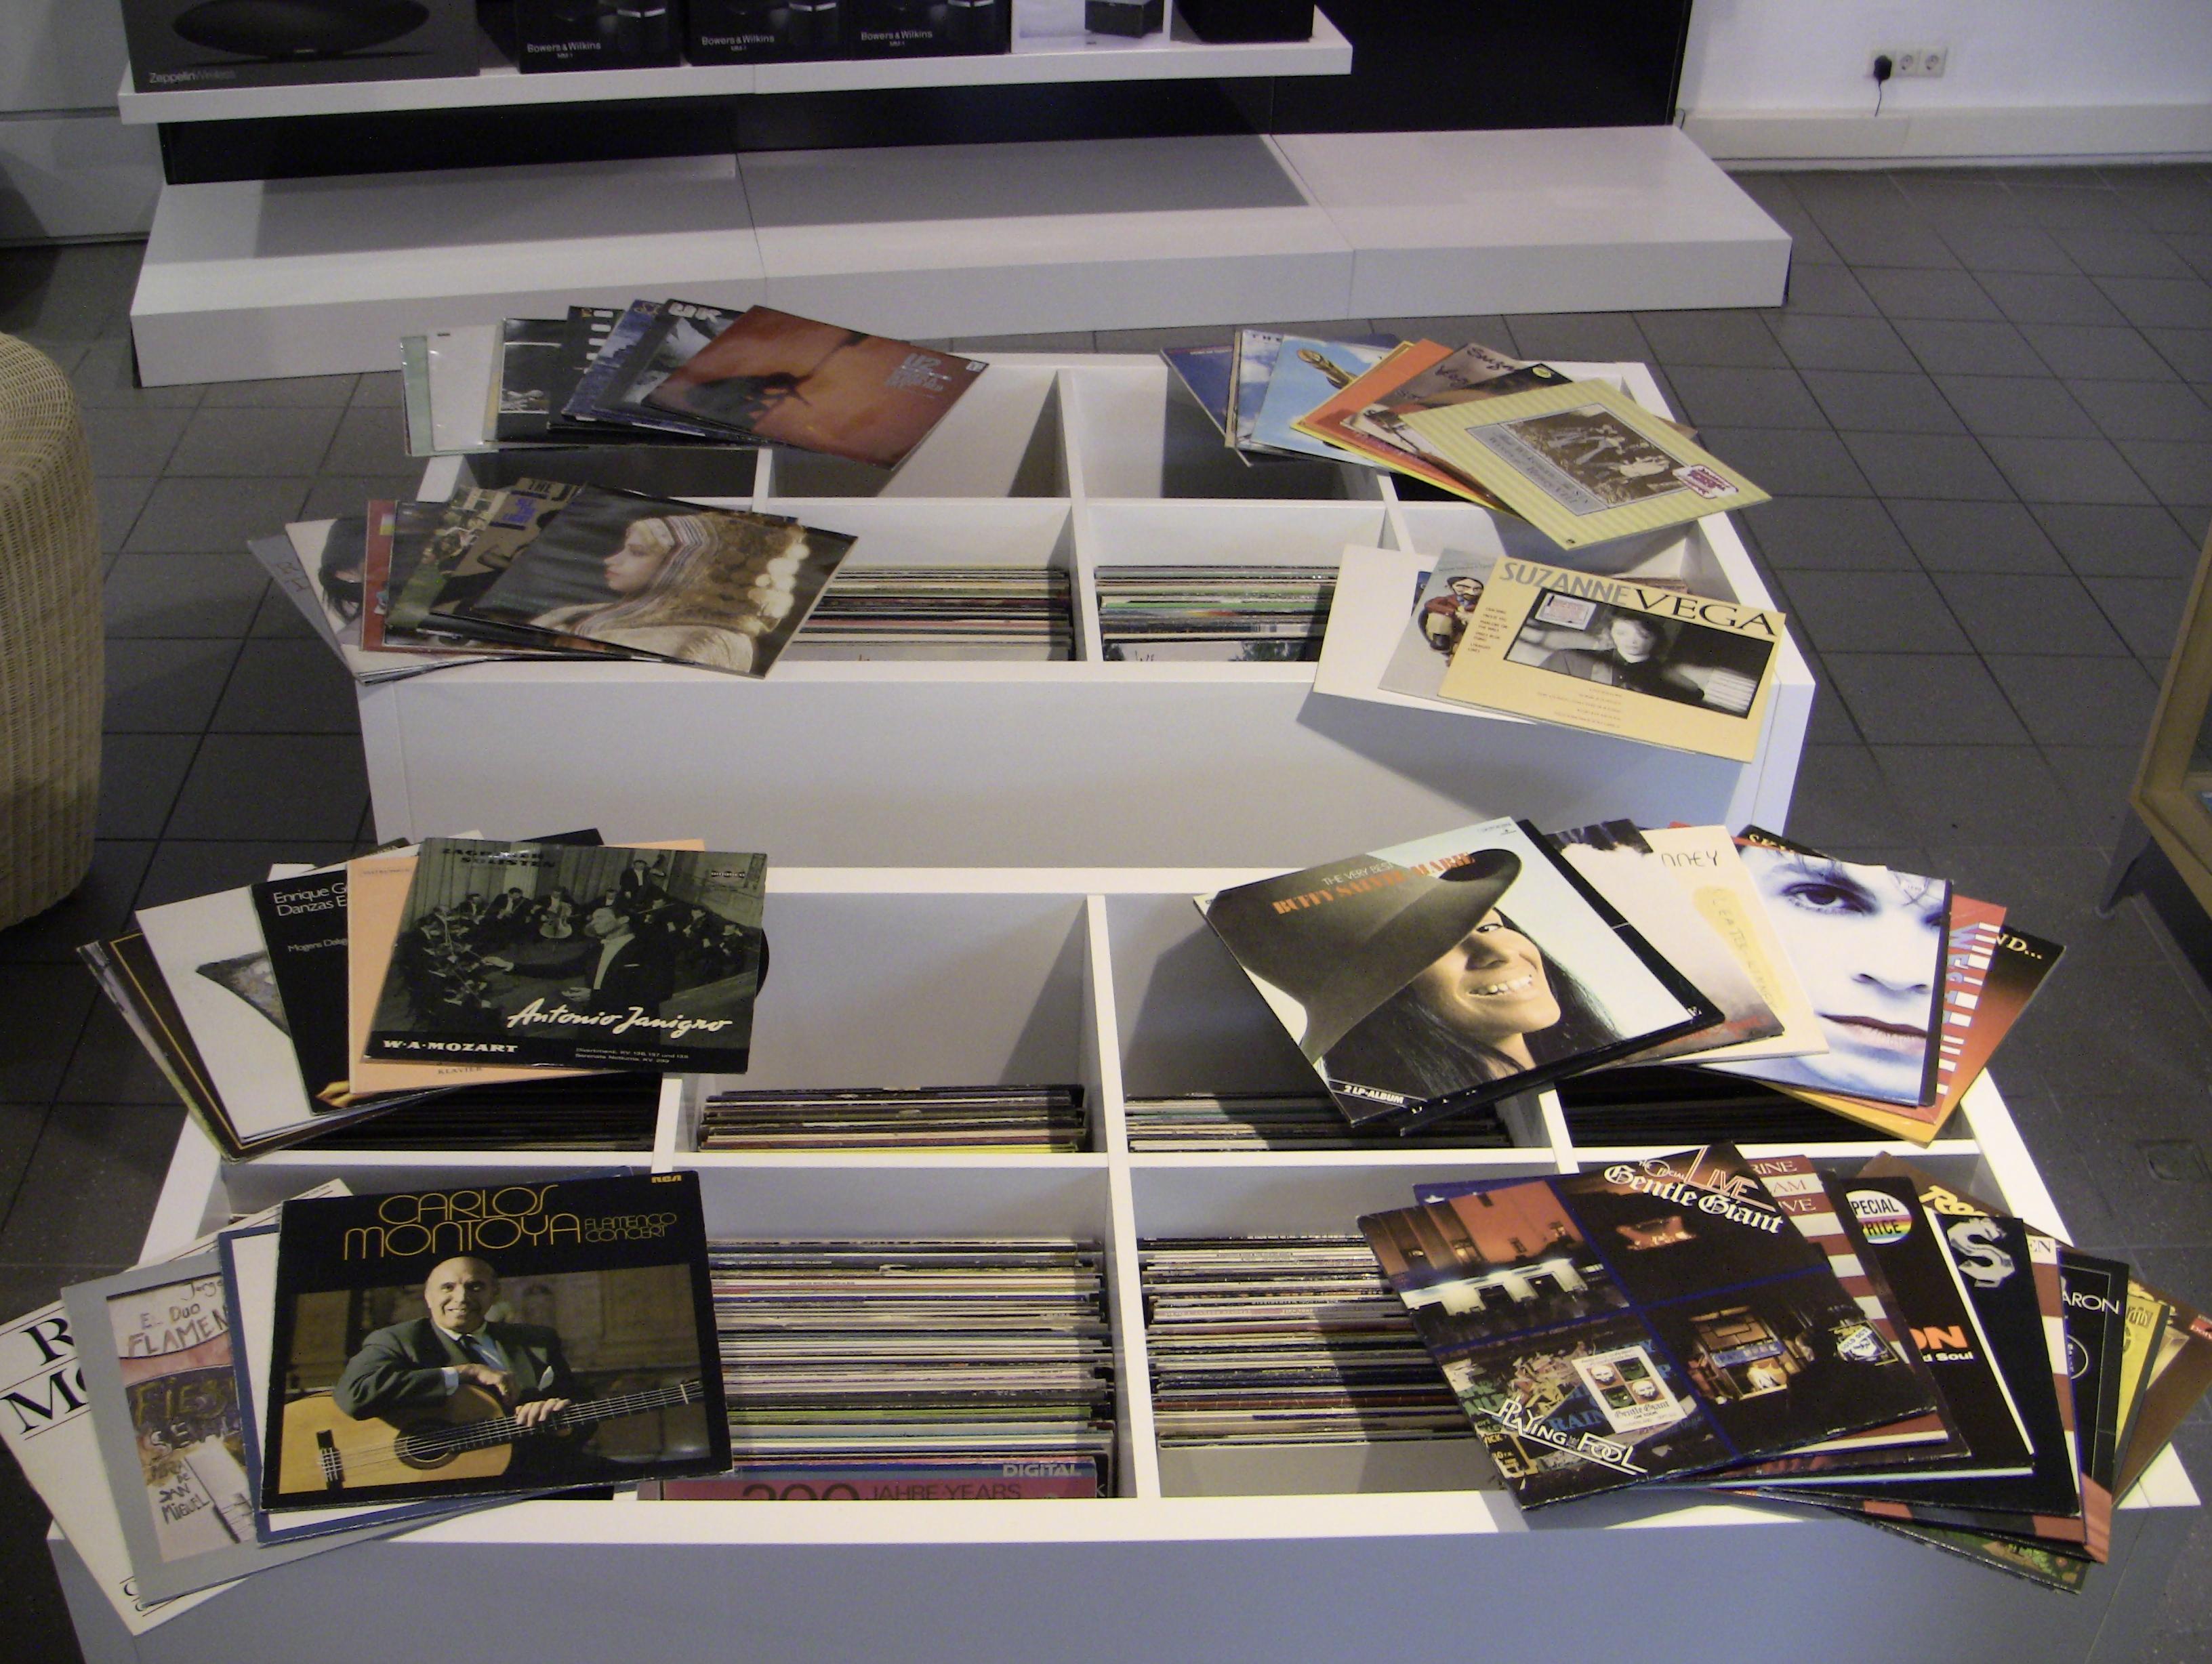 gebrauchte lp s tv hifi studio kemper ulm. Black Bedroom Furniture Sets. Home Design Ideas